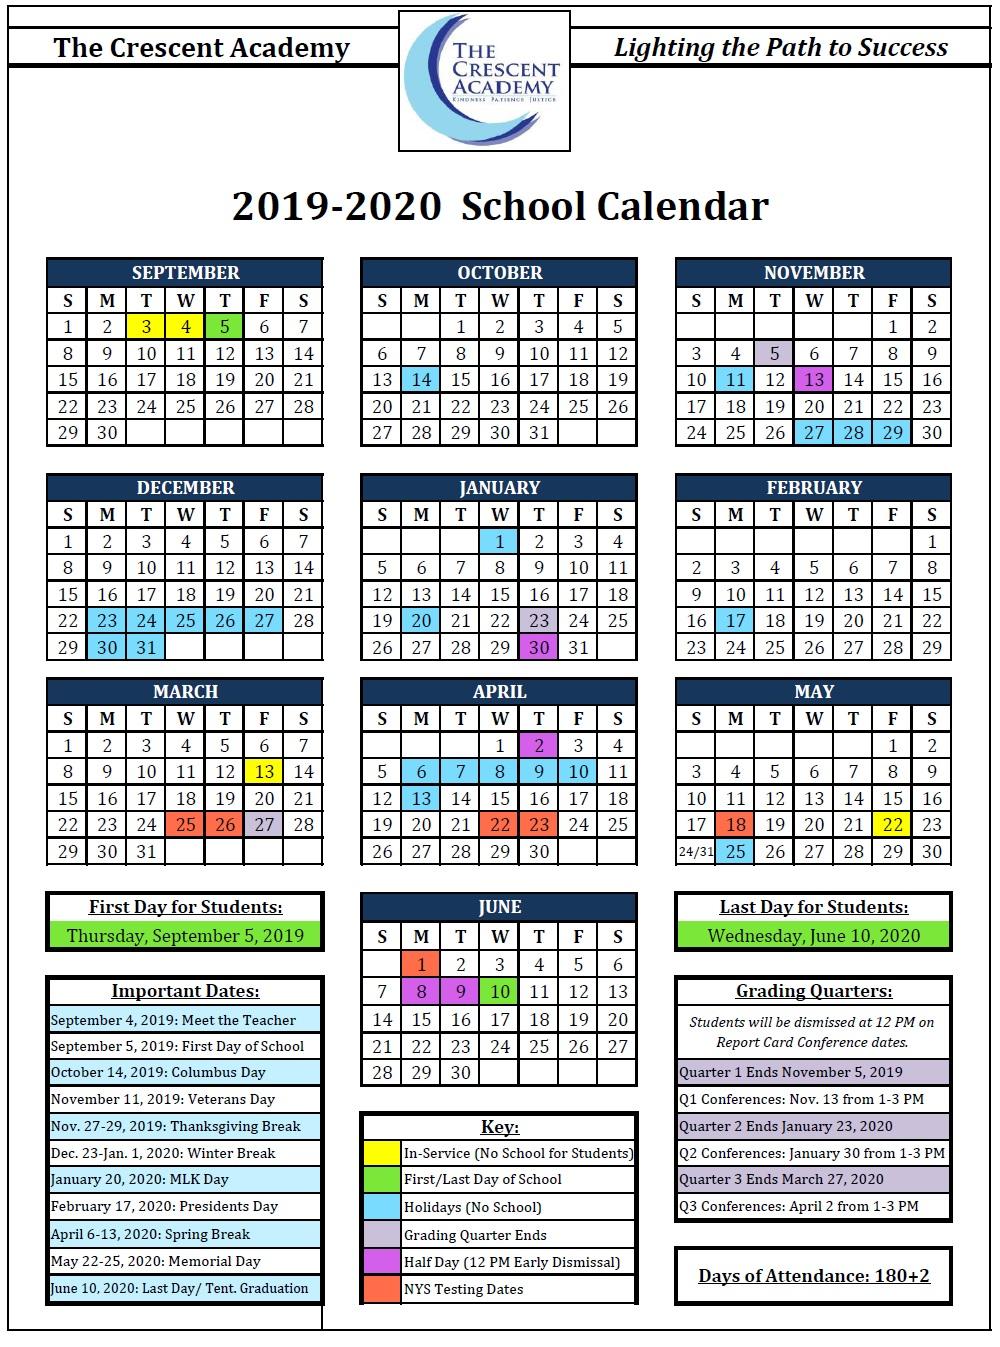 Presidents Day 2020 Calendar.Calendar The Crescent Academy